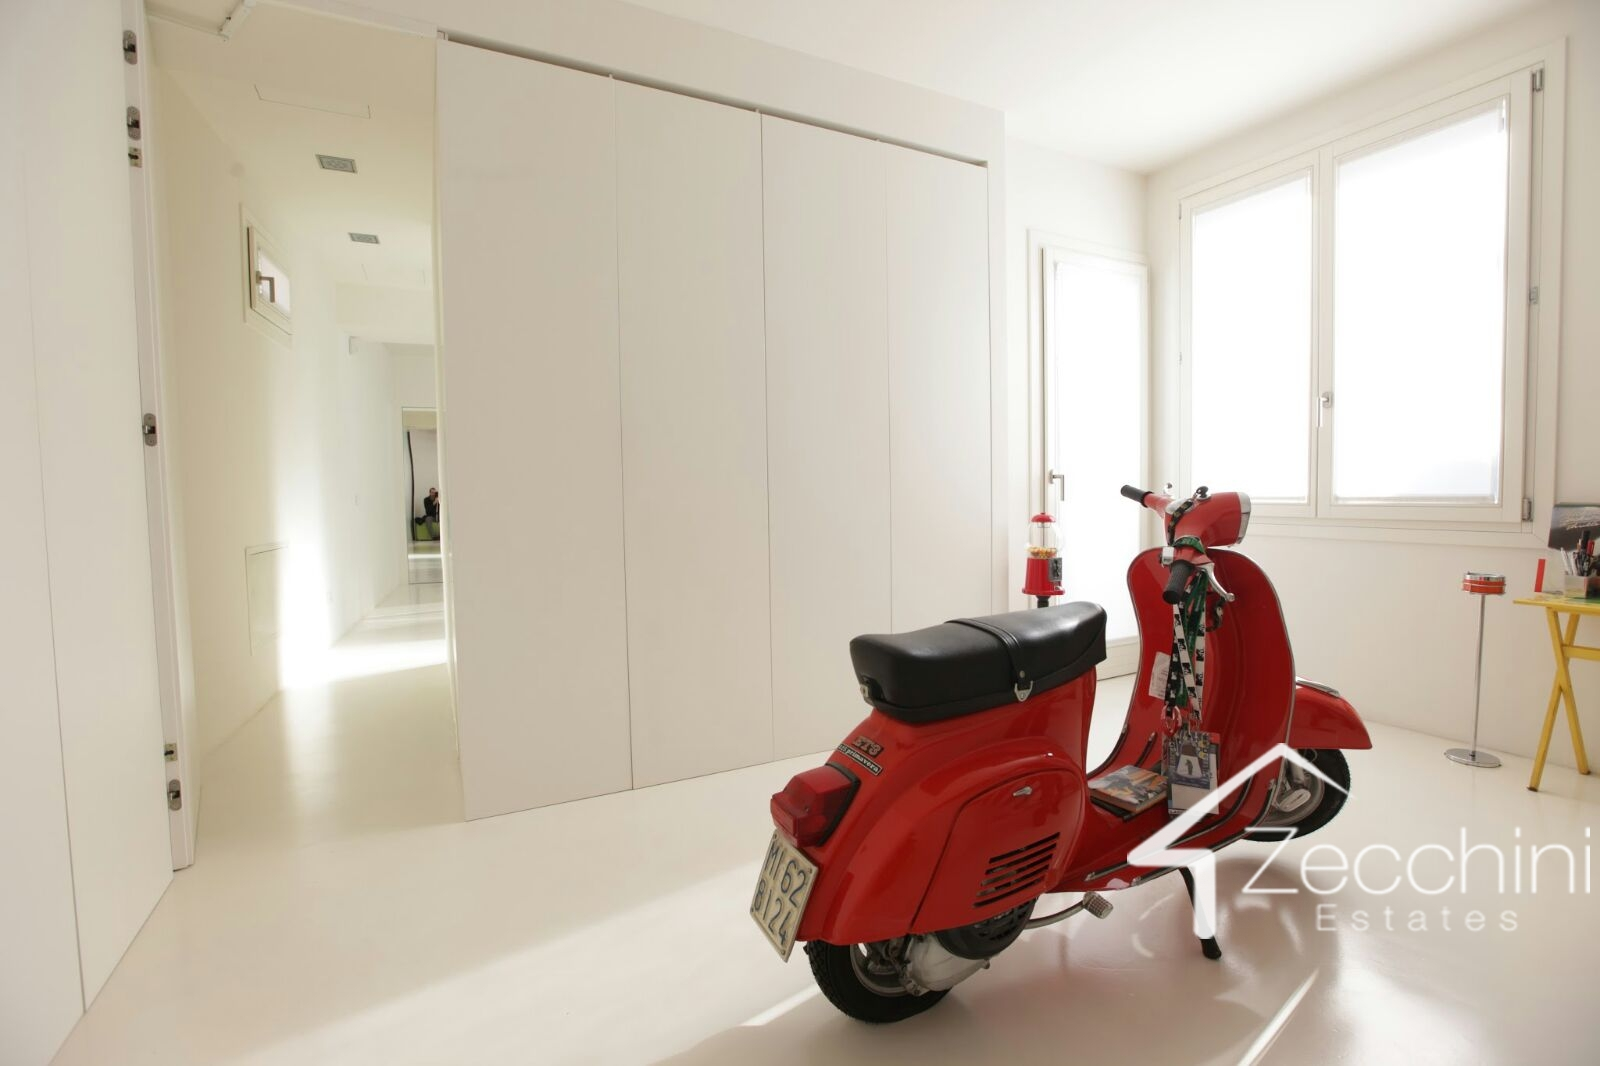 Milano | Appartamento in Vendita in Via Perasto | lacasadimilano.it